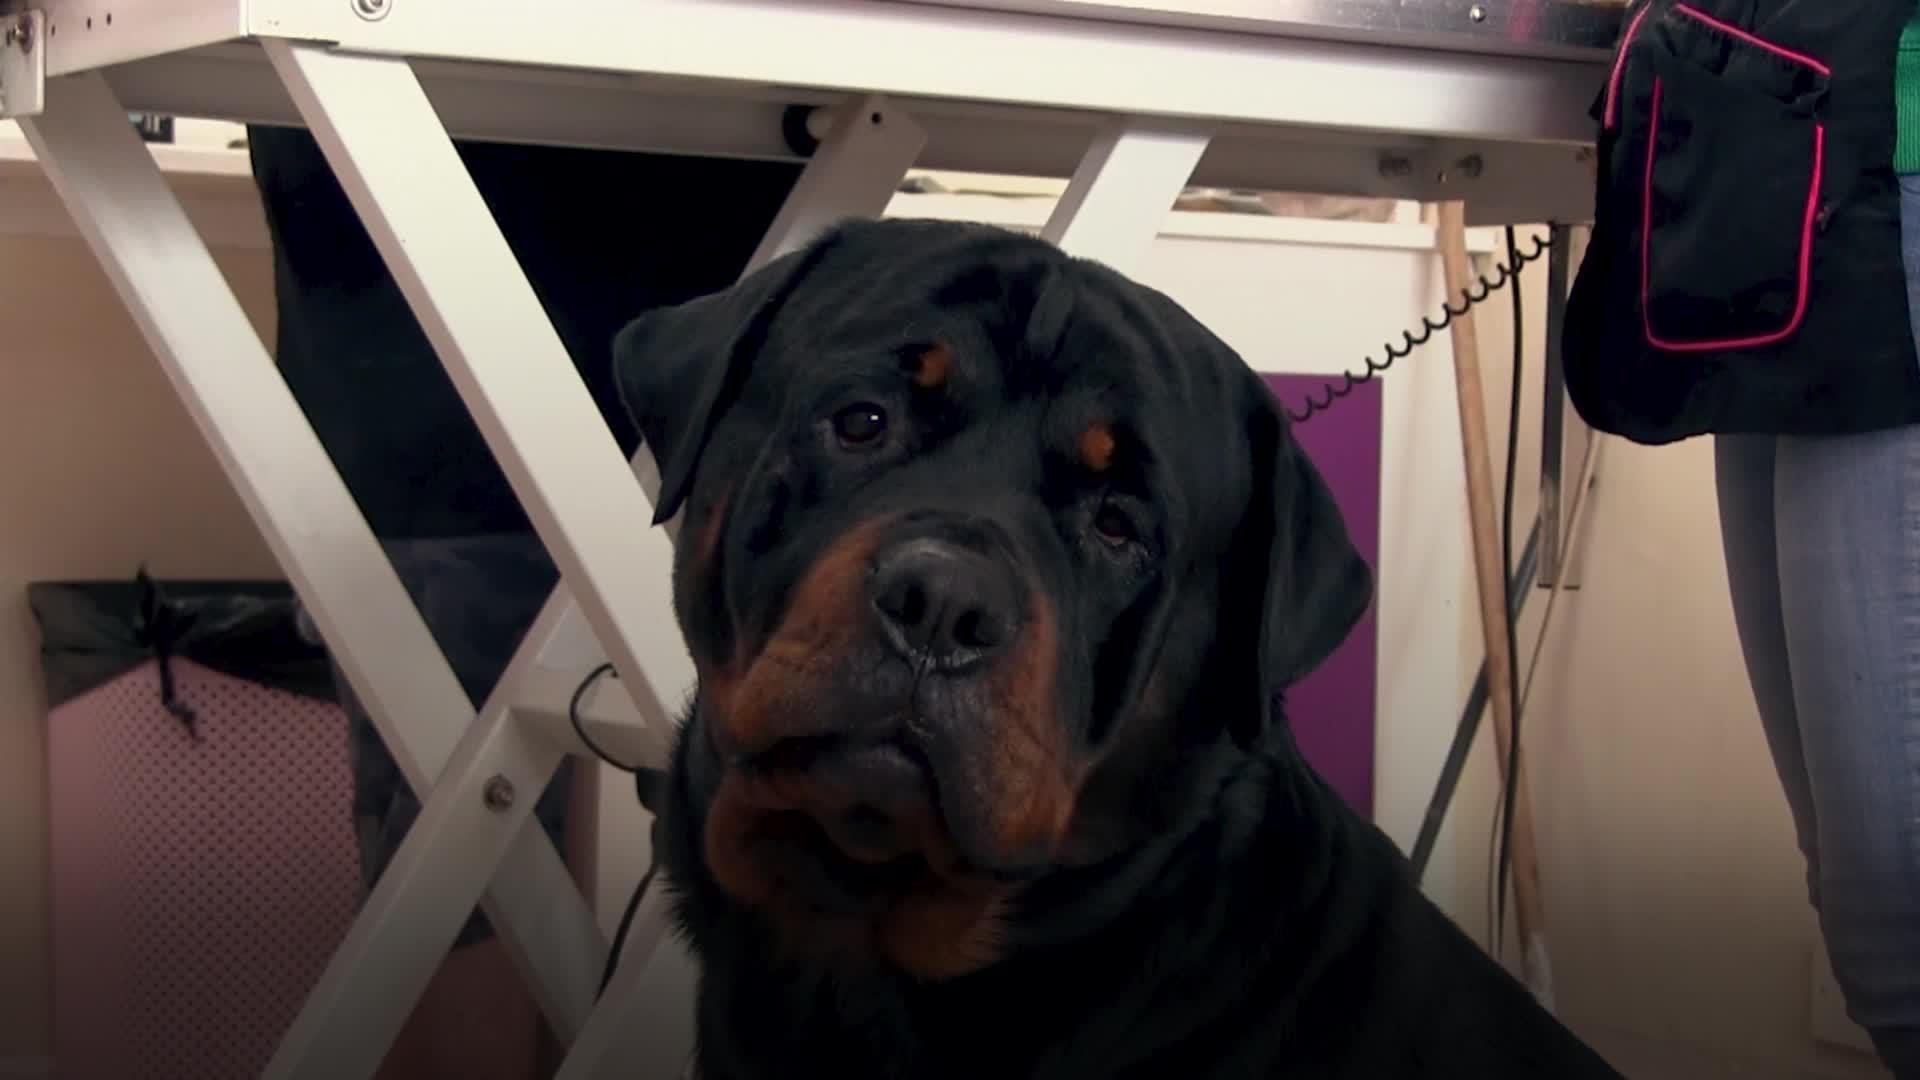 Dogs shorn of lockdown locks as groomers resume business